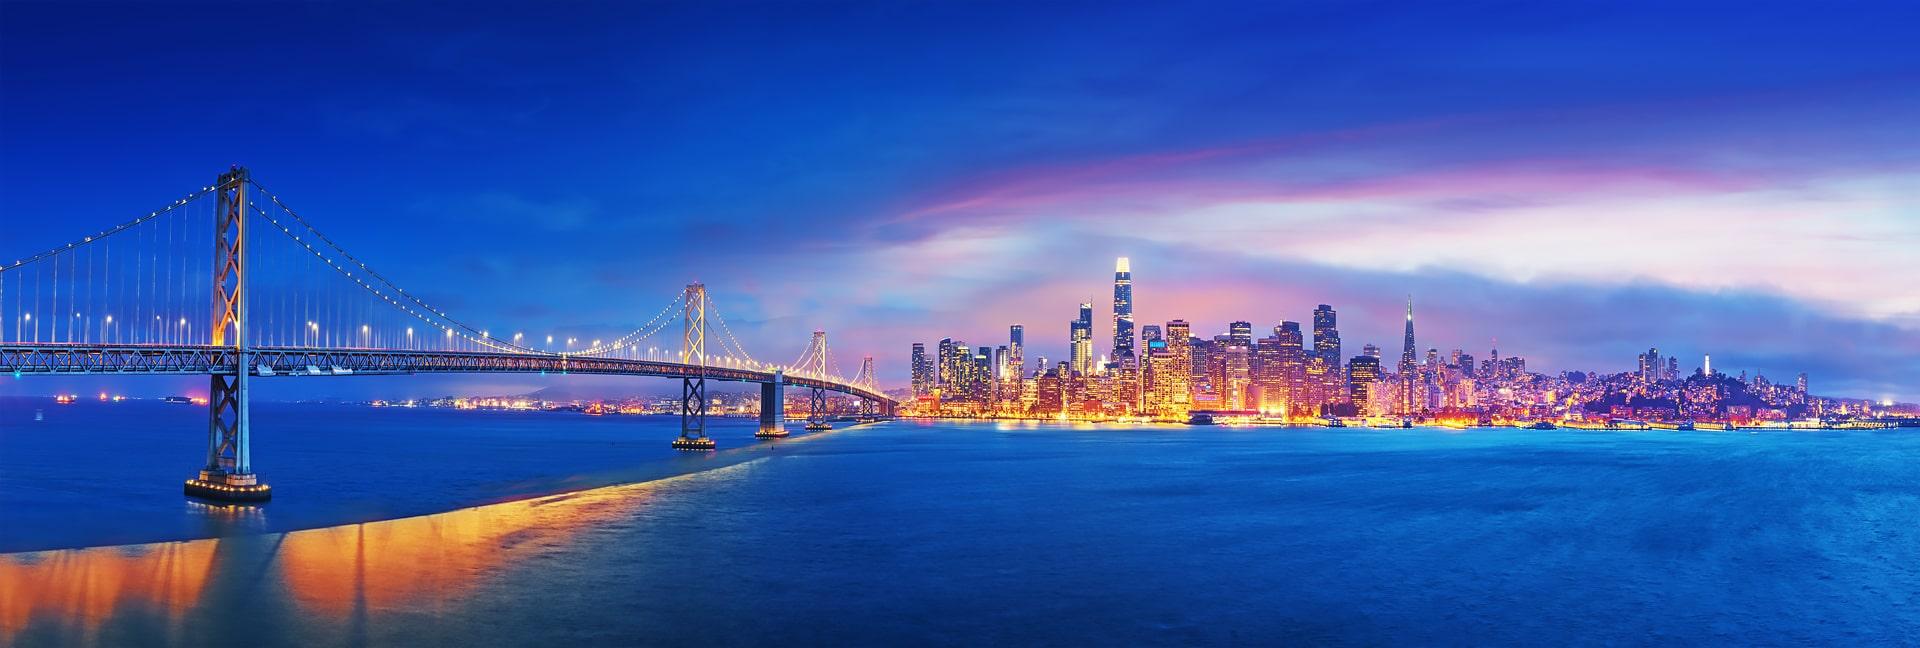 Escuela de inglés en San Francisco | Converse International School of Languages San Francisco